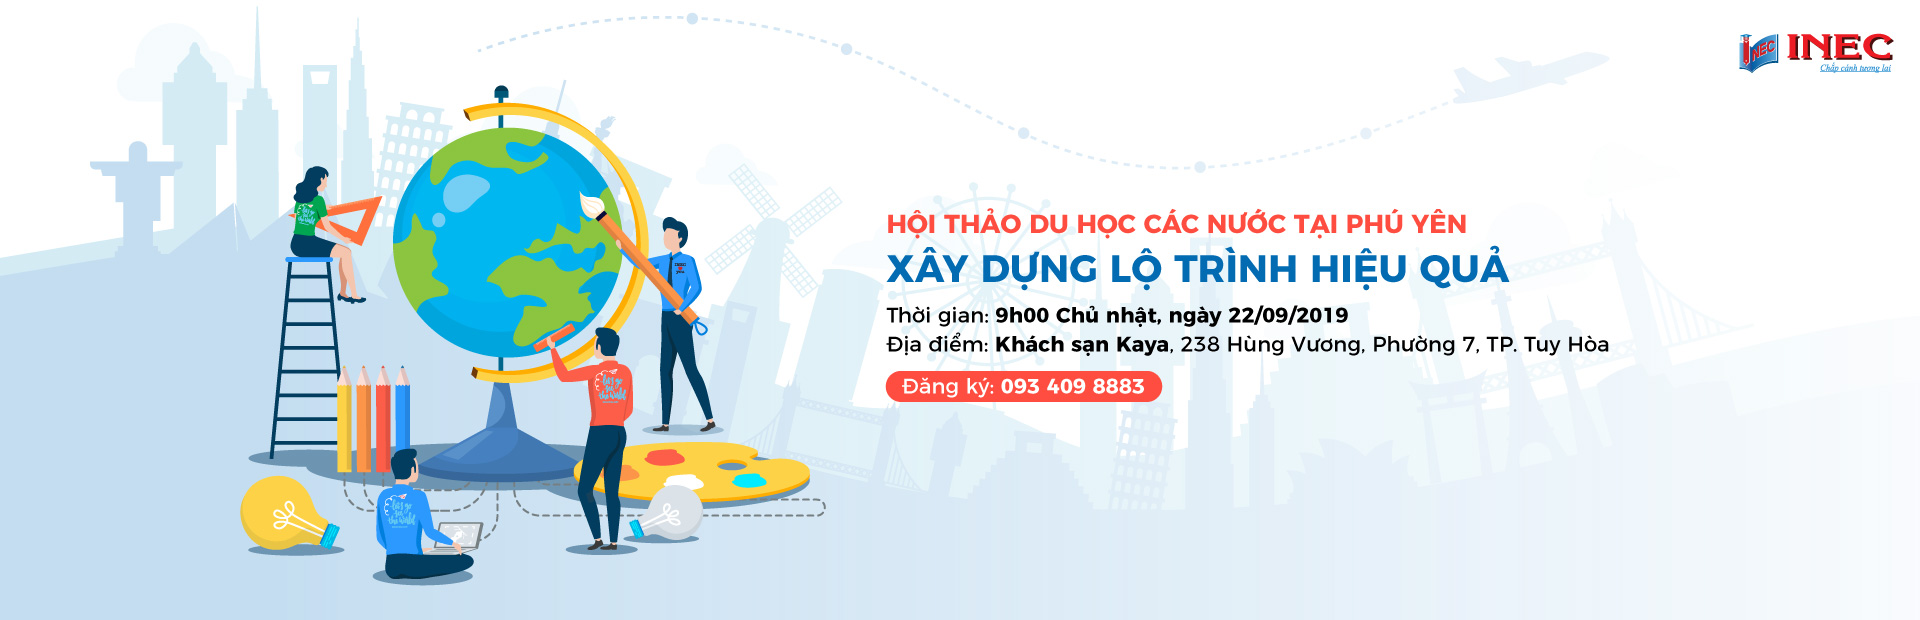 HT Phu Yen